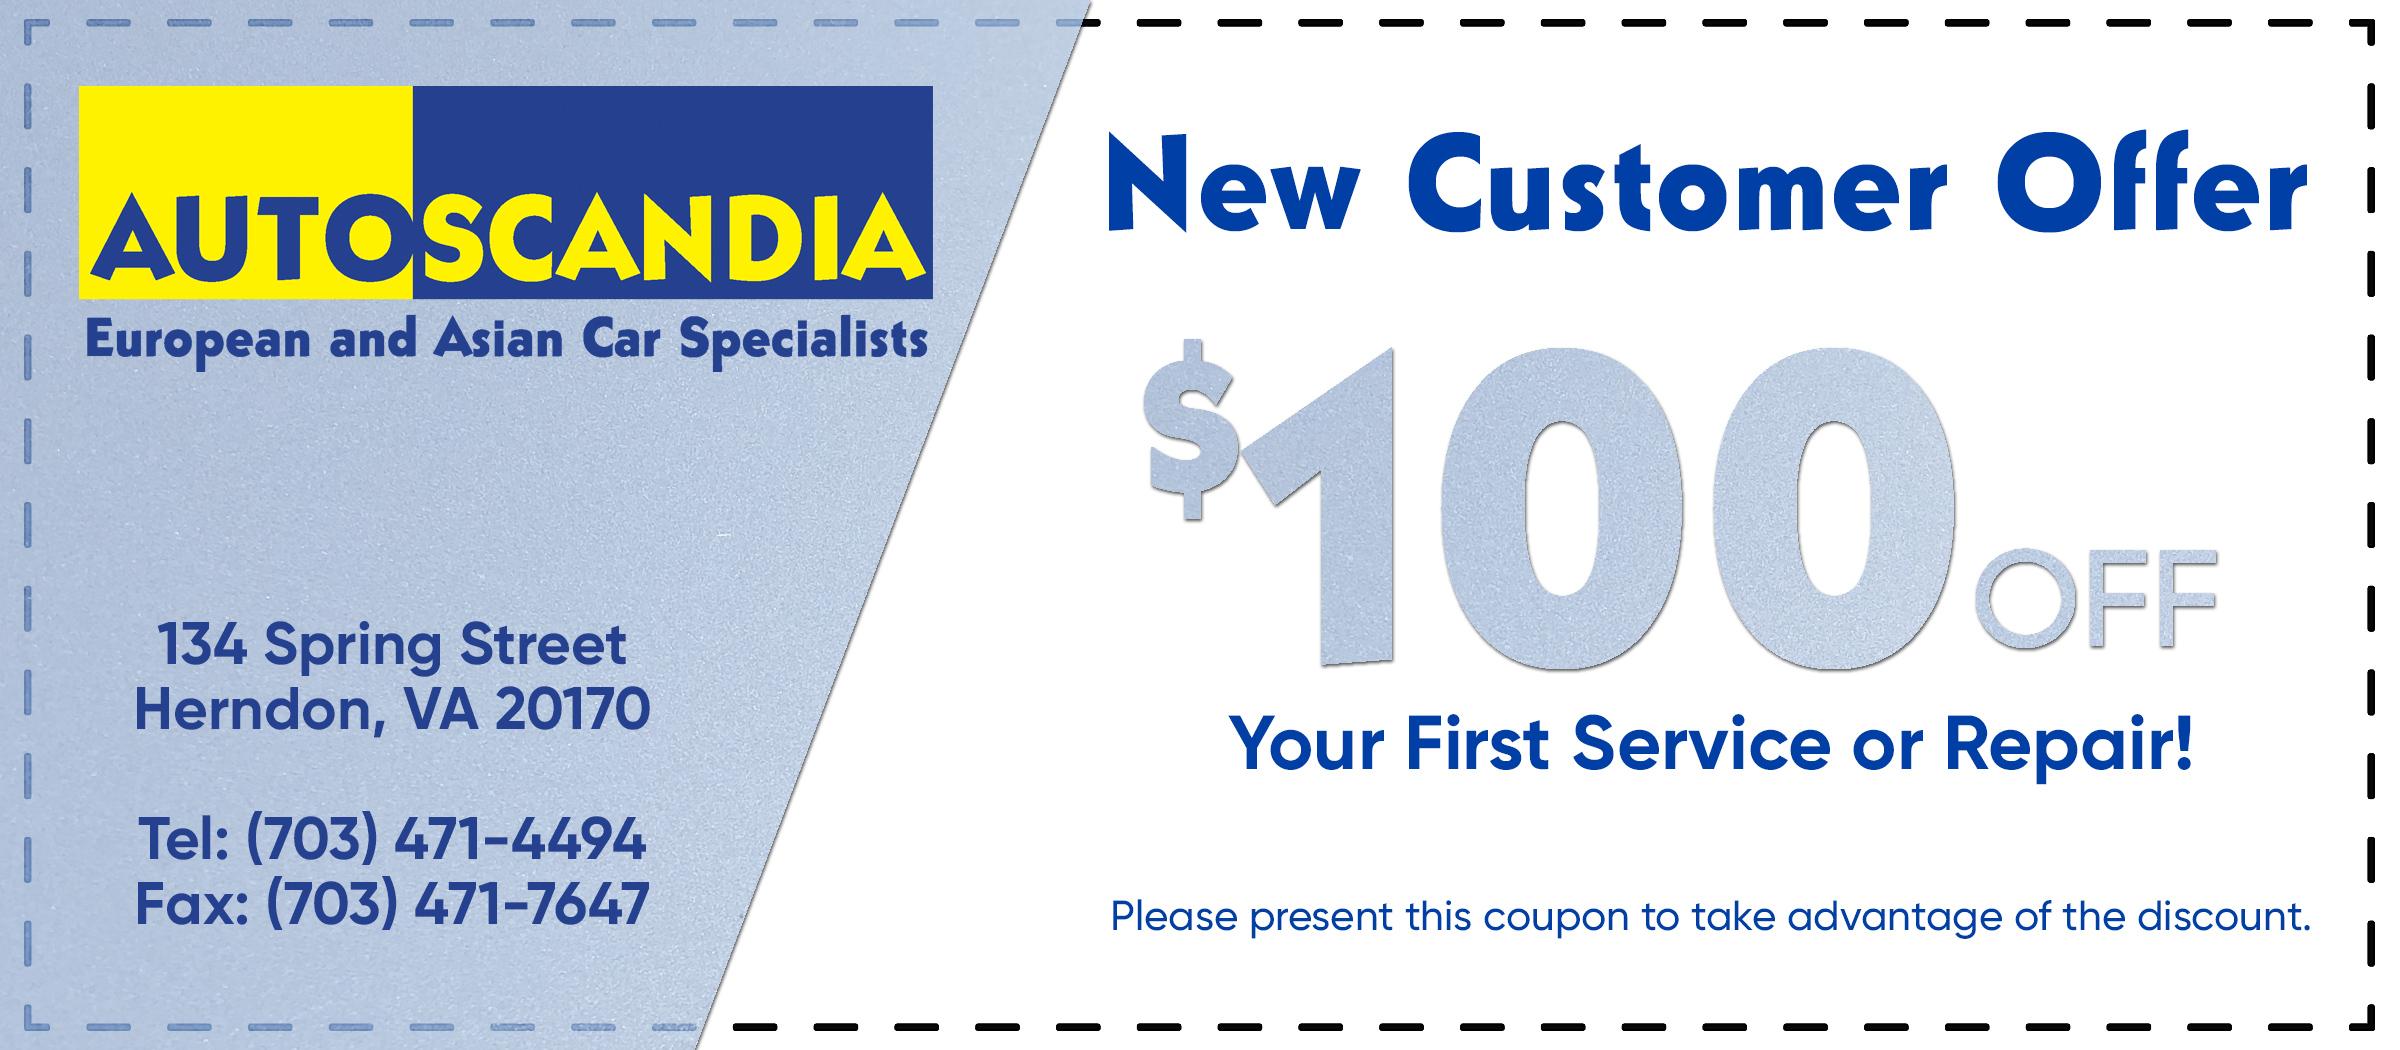 AutoScandia New Customer Offer Coupon Herndon Virginia